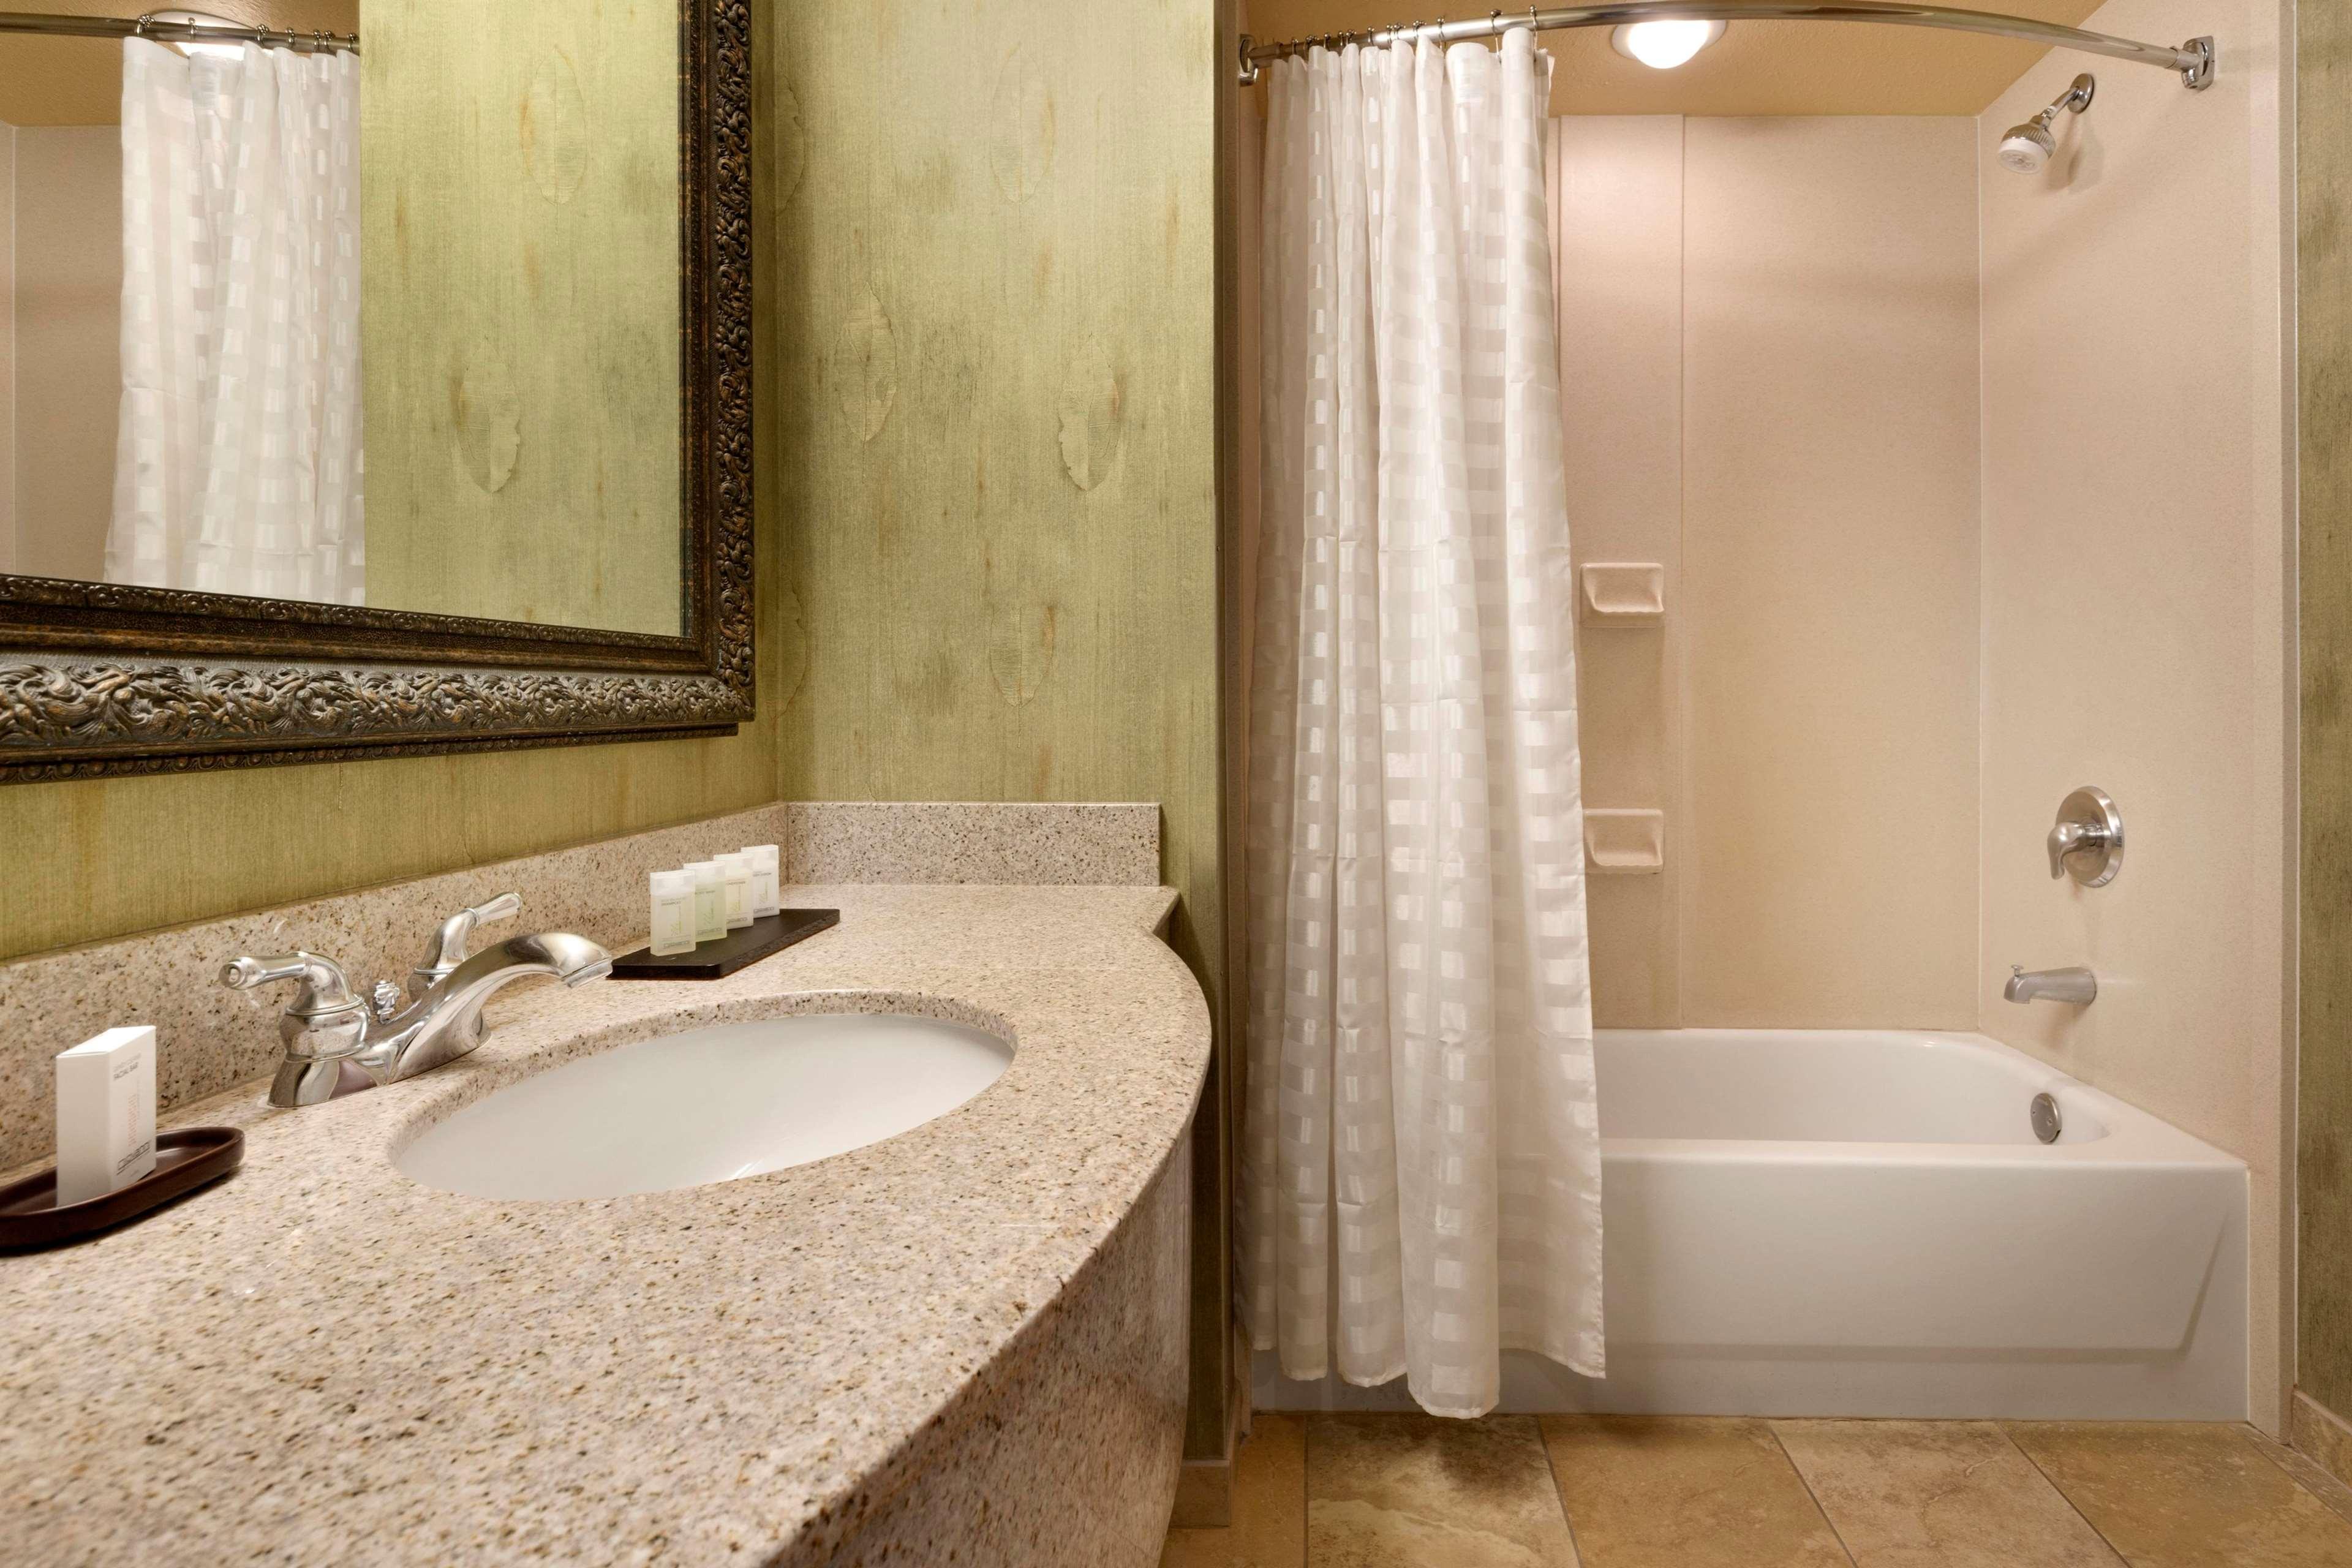 Embassy Suites by Hilton Albuquerque Hotel & Spa image 22